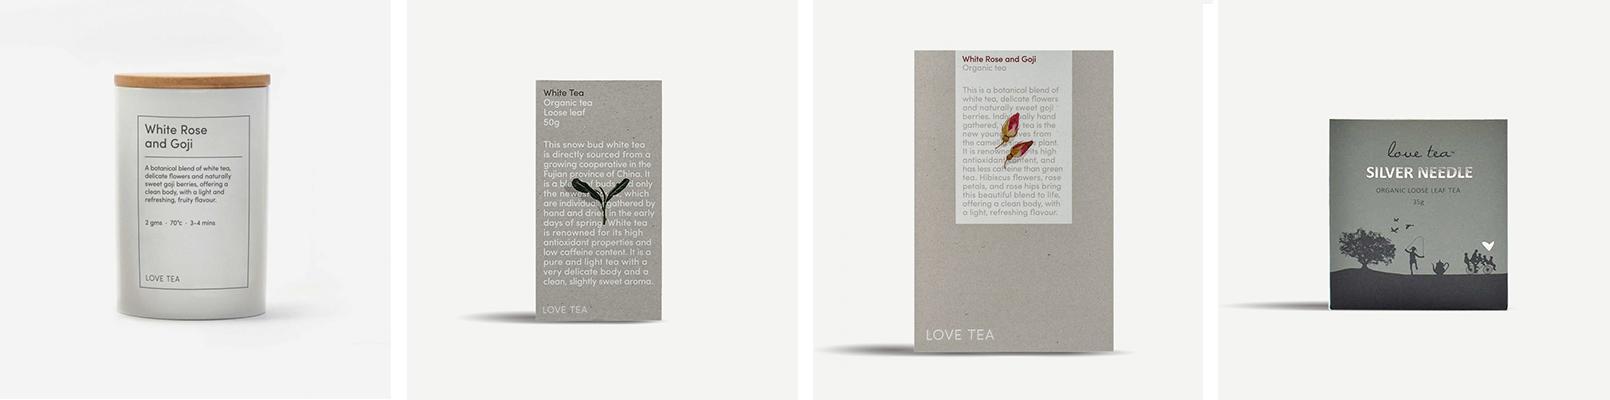 benefits-of-white-tea